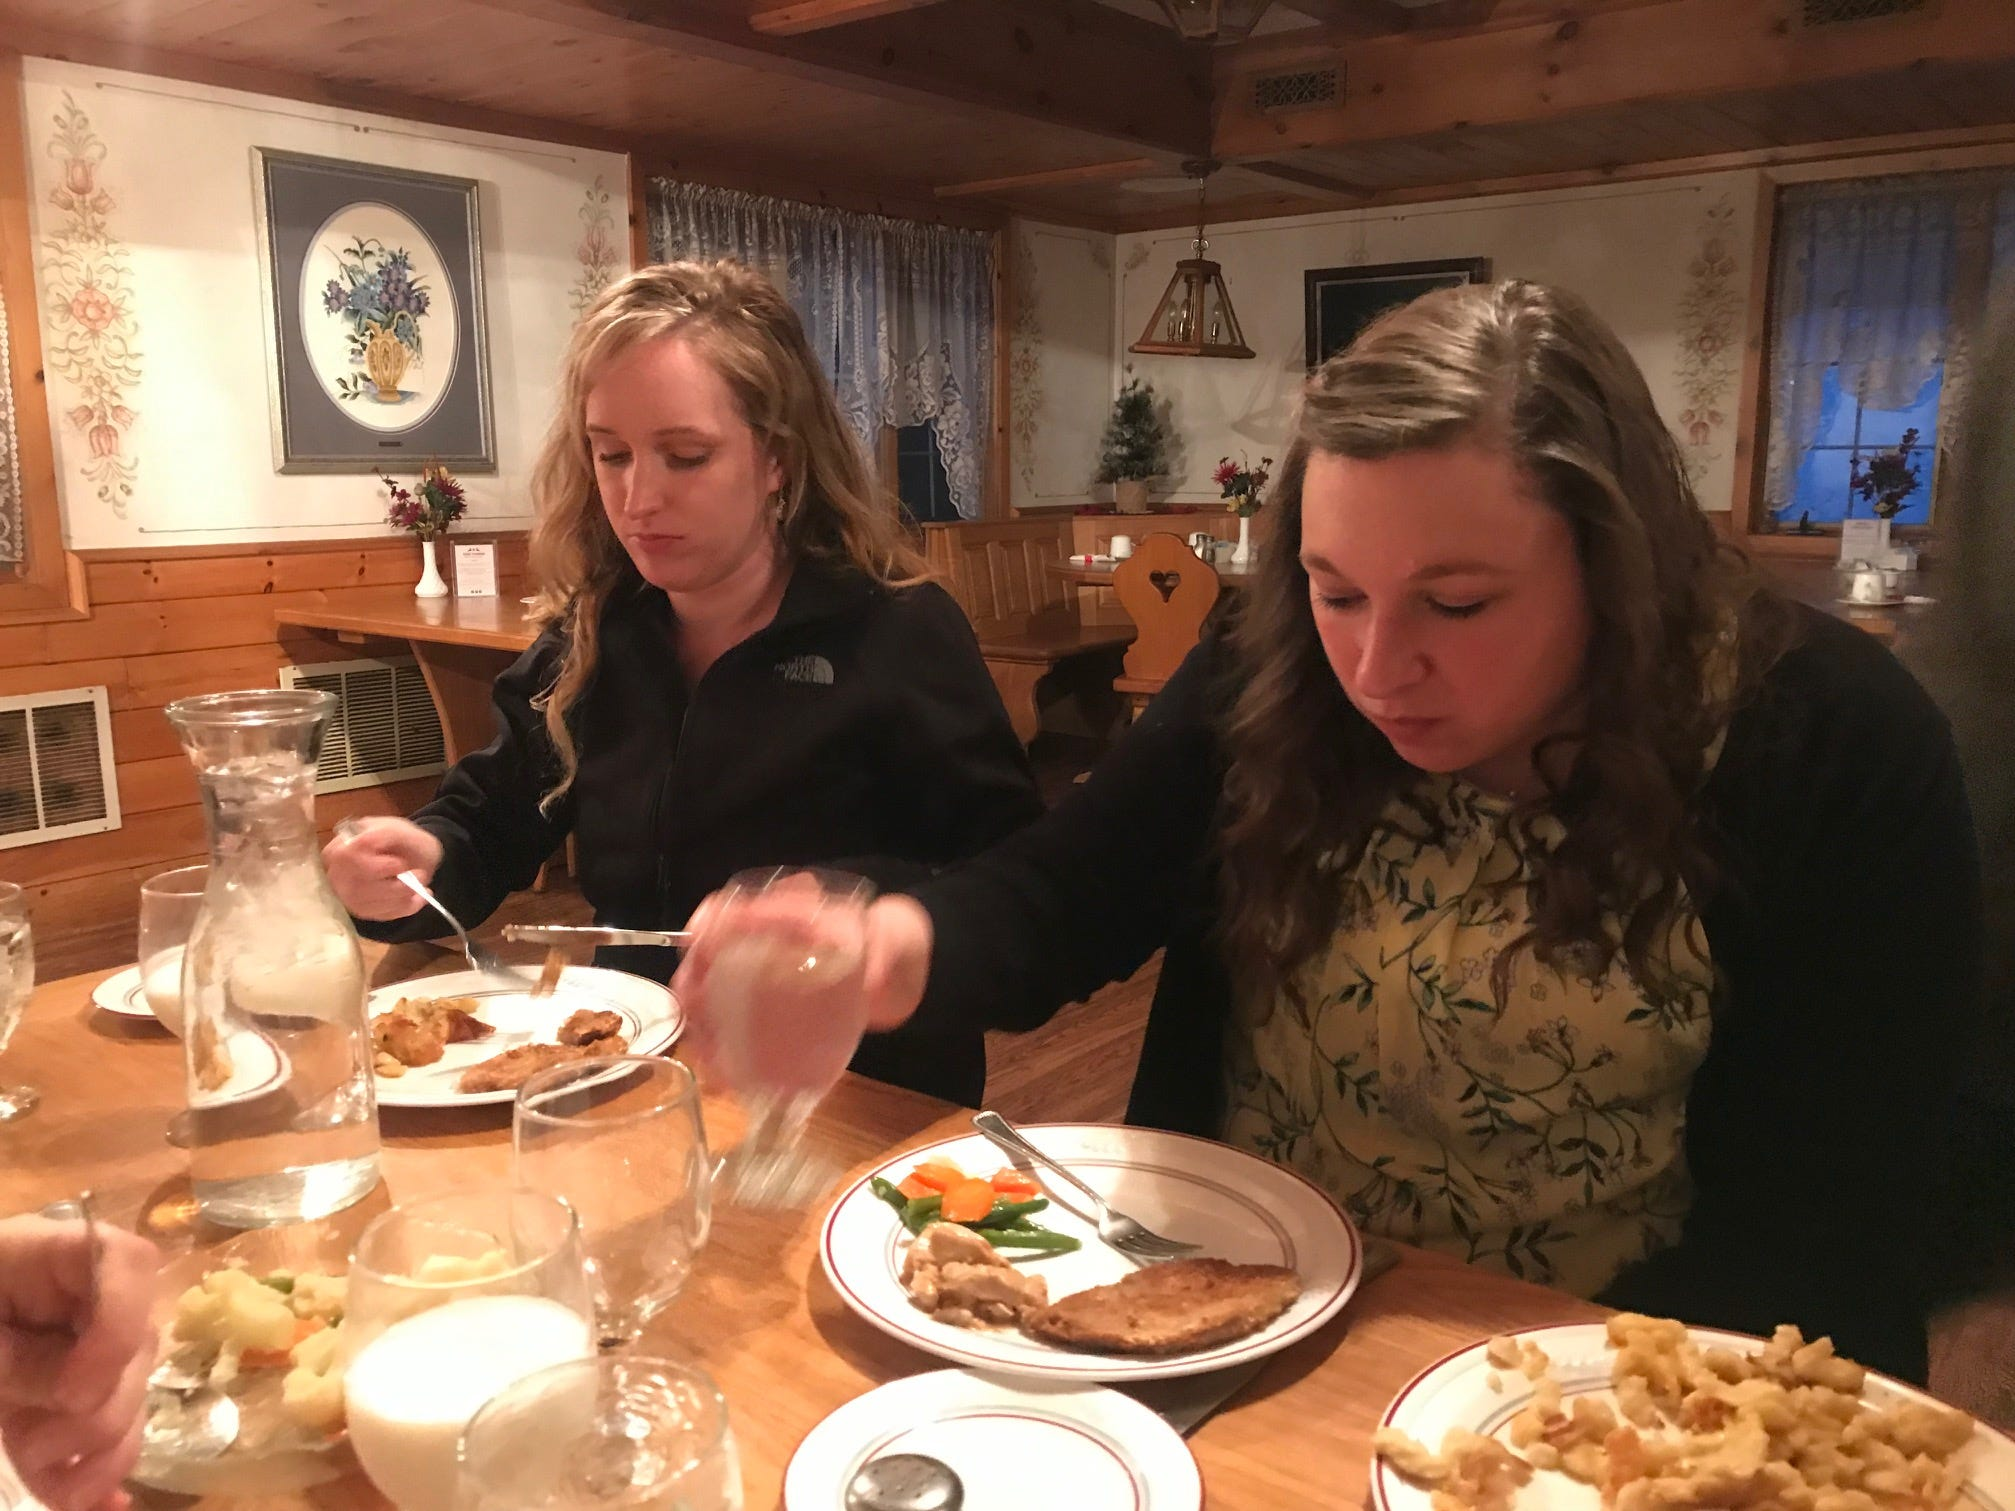 Sarah Anchenbach (left) and Tess Zettle enjoy Swiss cuisine inside the Chalet Landhaus Inn and Restaurant in New Glarus.